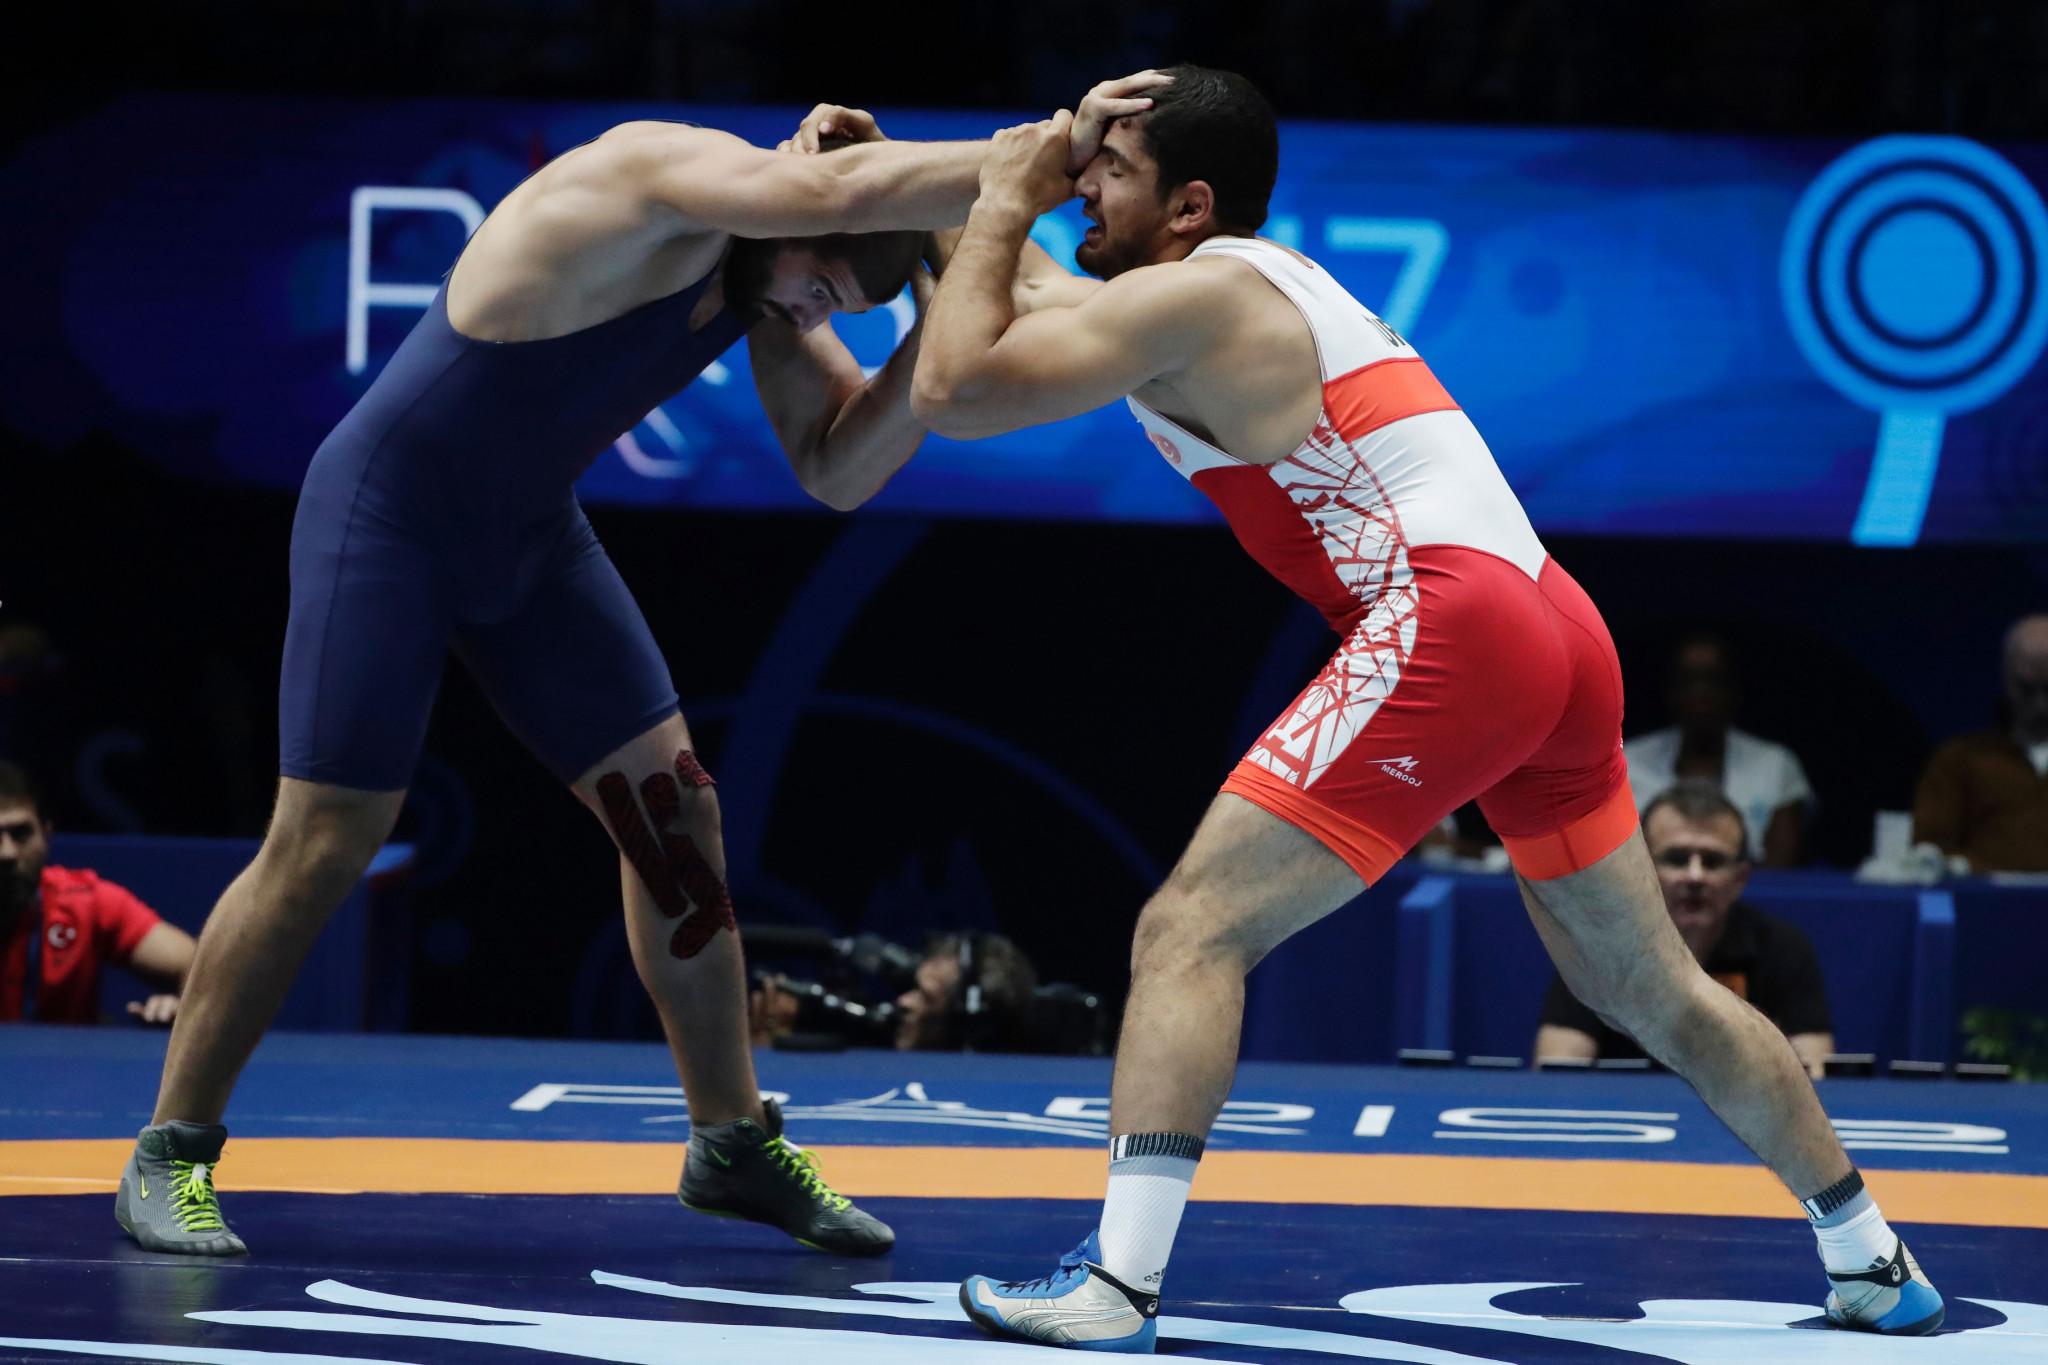 UWW release documentary on rivalry between Akgul and Petriashvili